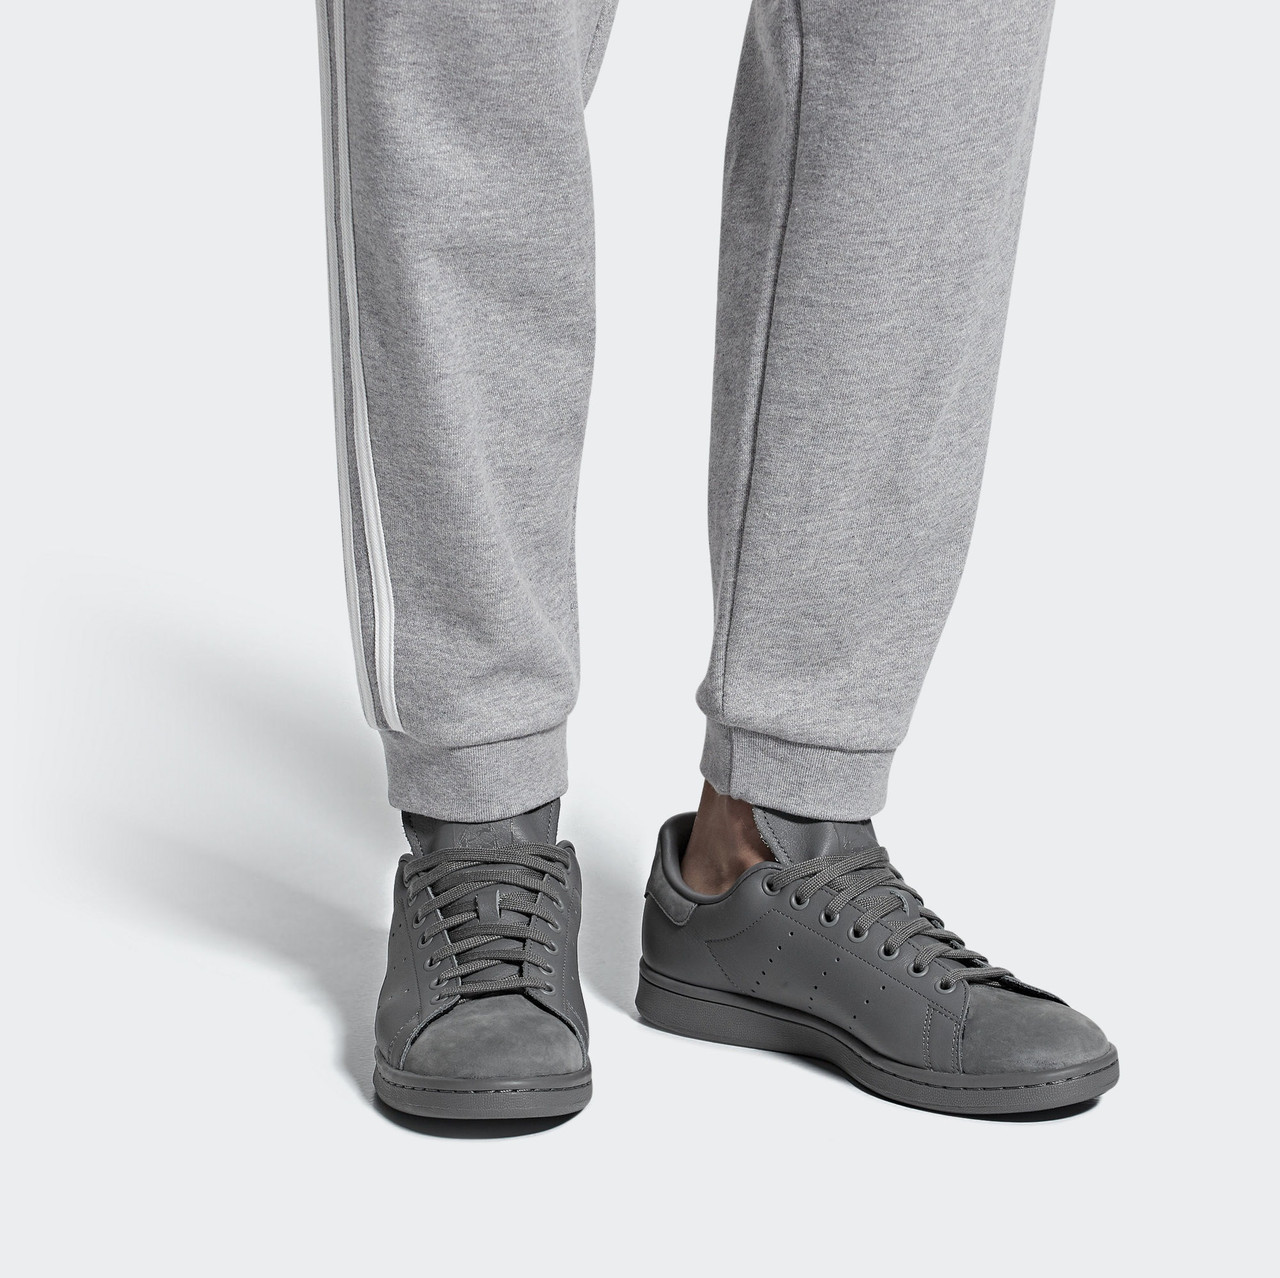 premium selection b57fa 5d1ac Кроссовки Adidas Stan Smith US 9.5